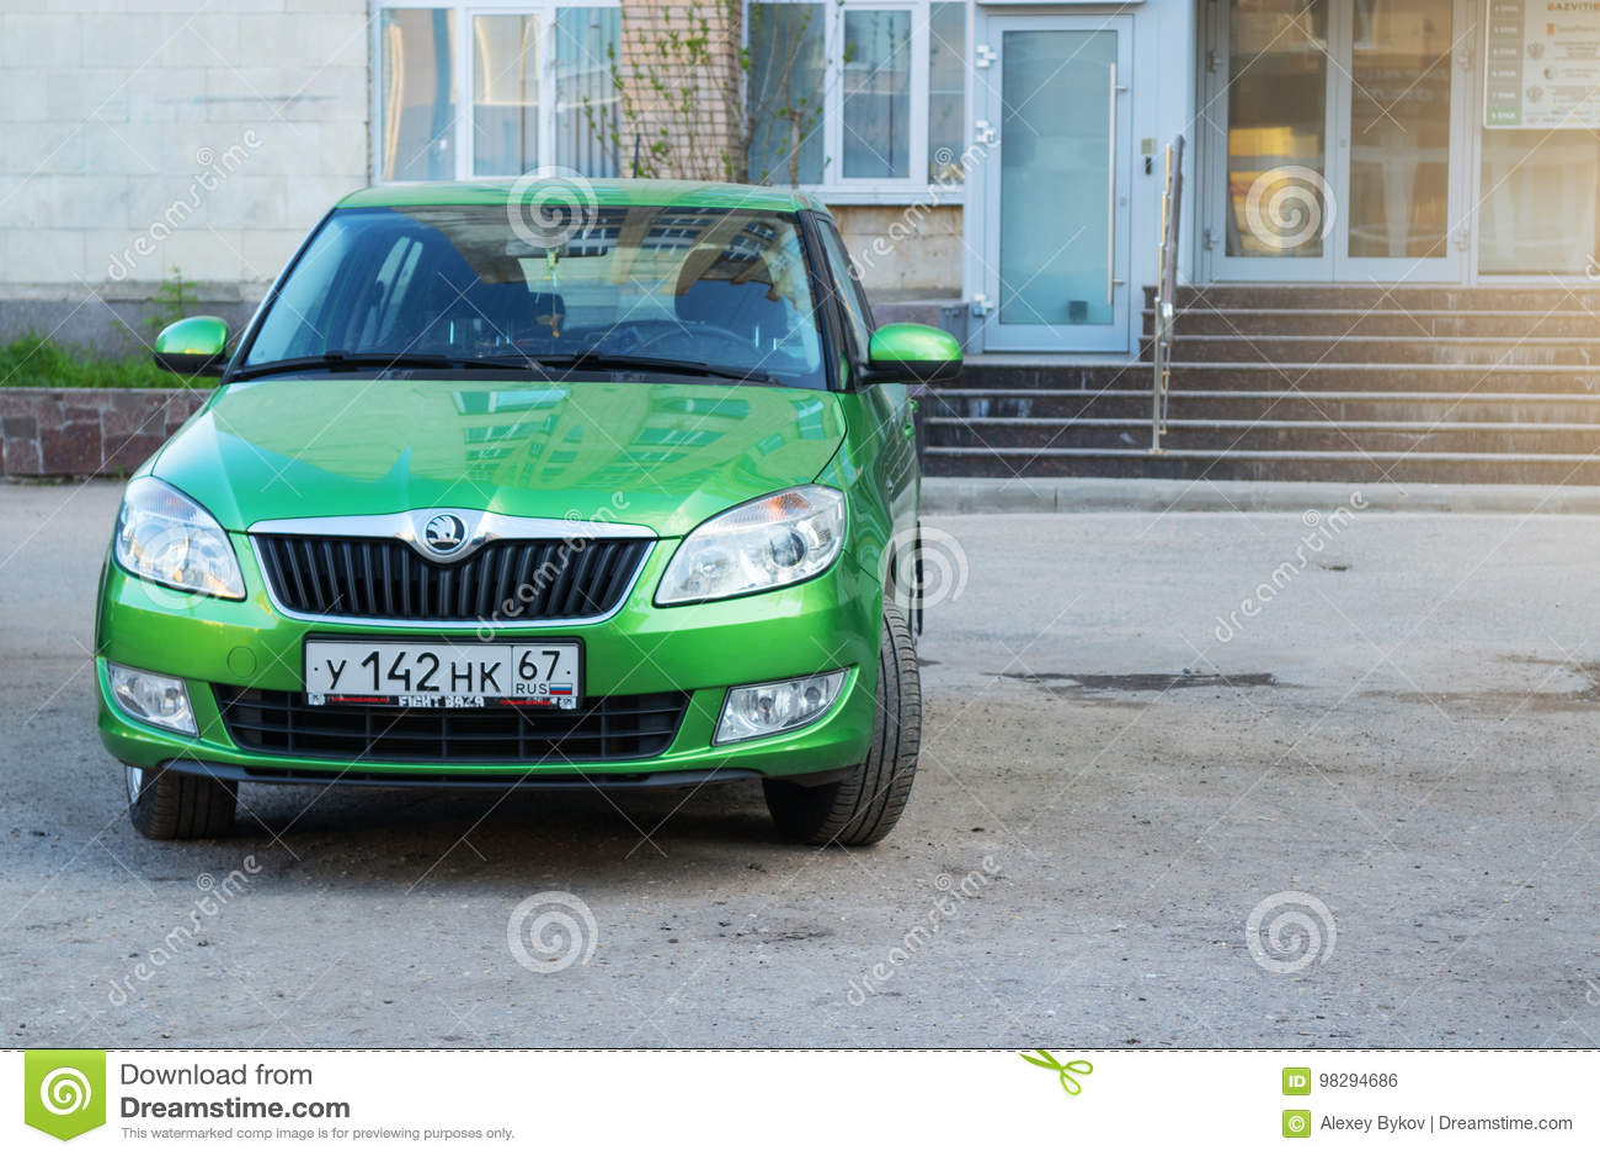 New Skoda Fabia Parked On Street Near House. Editorial Photo - Image ...